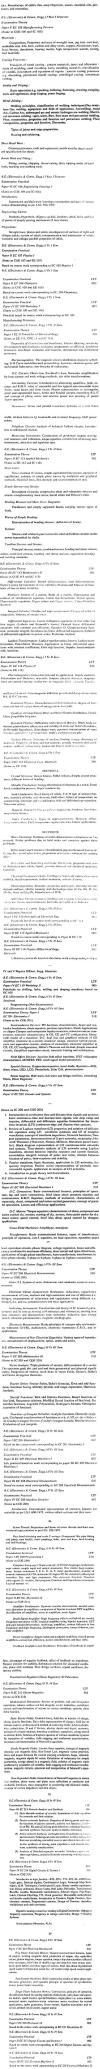 NSIT: Syllabus -Electronics & Communication Engineering